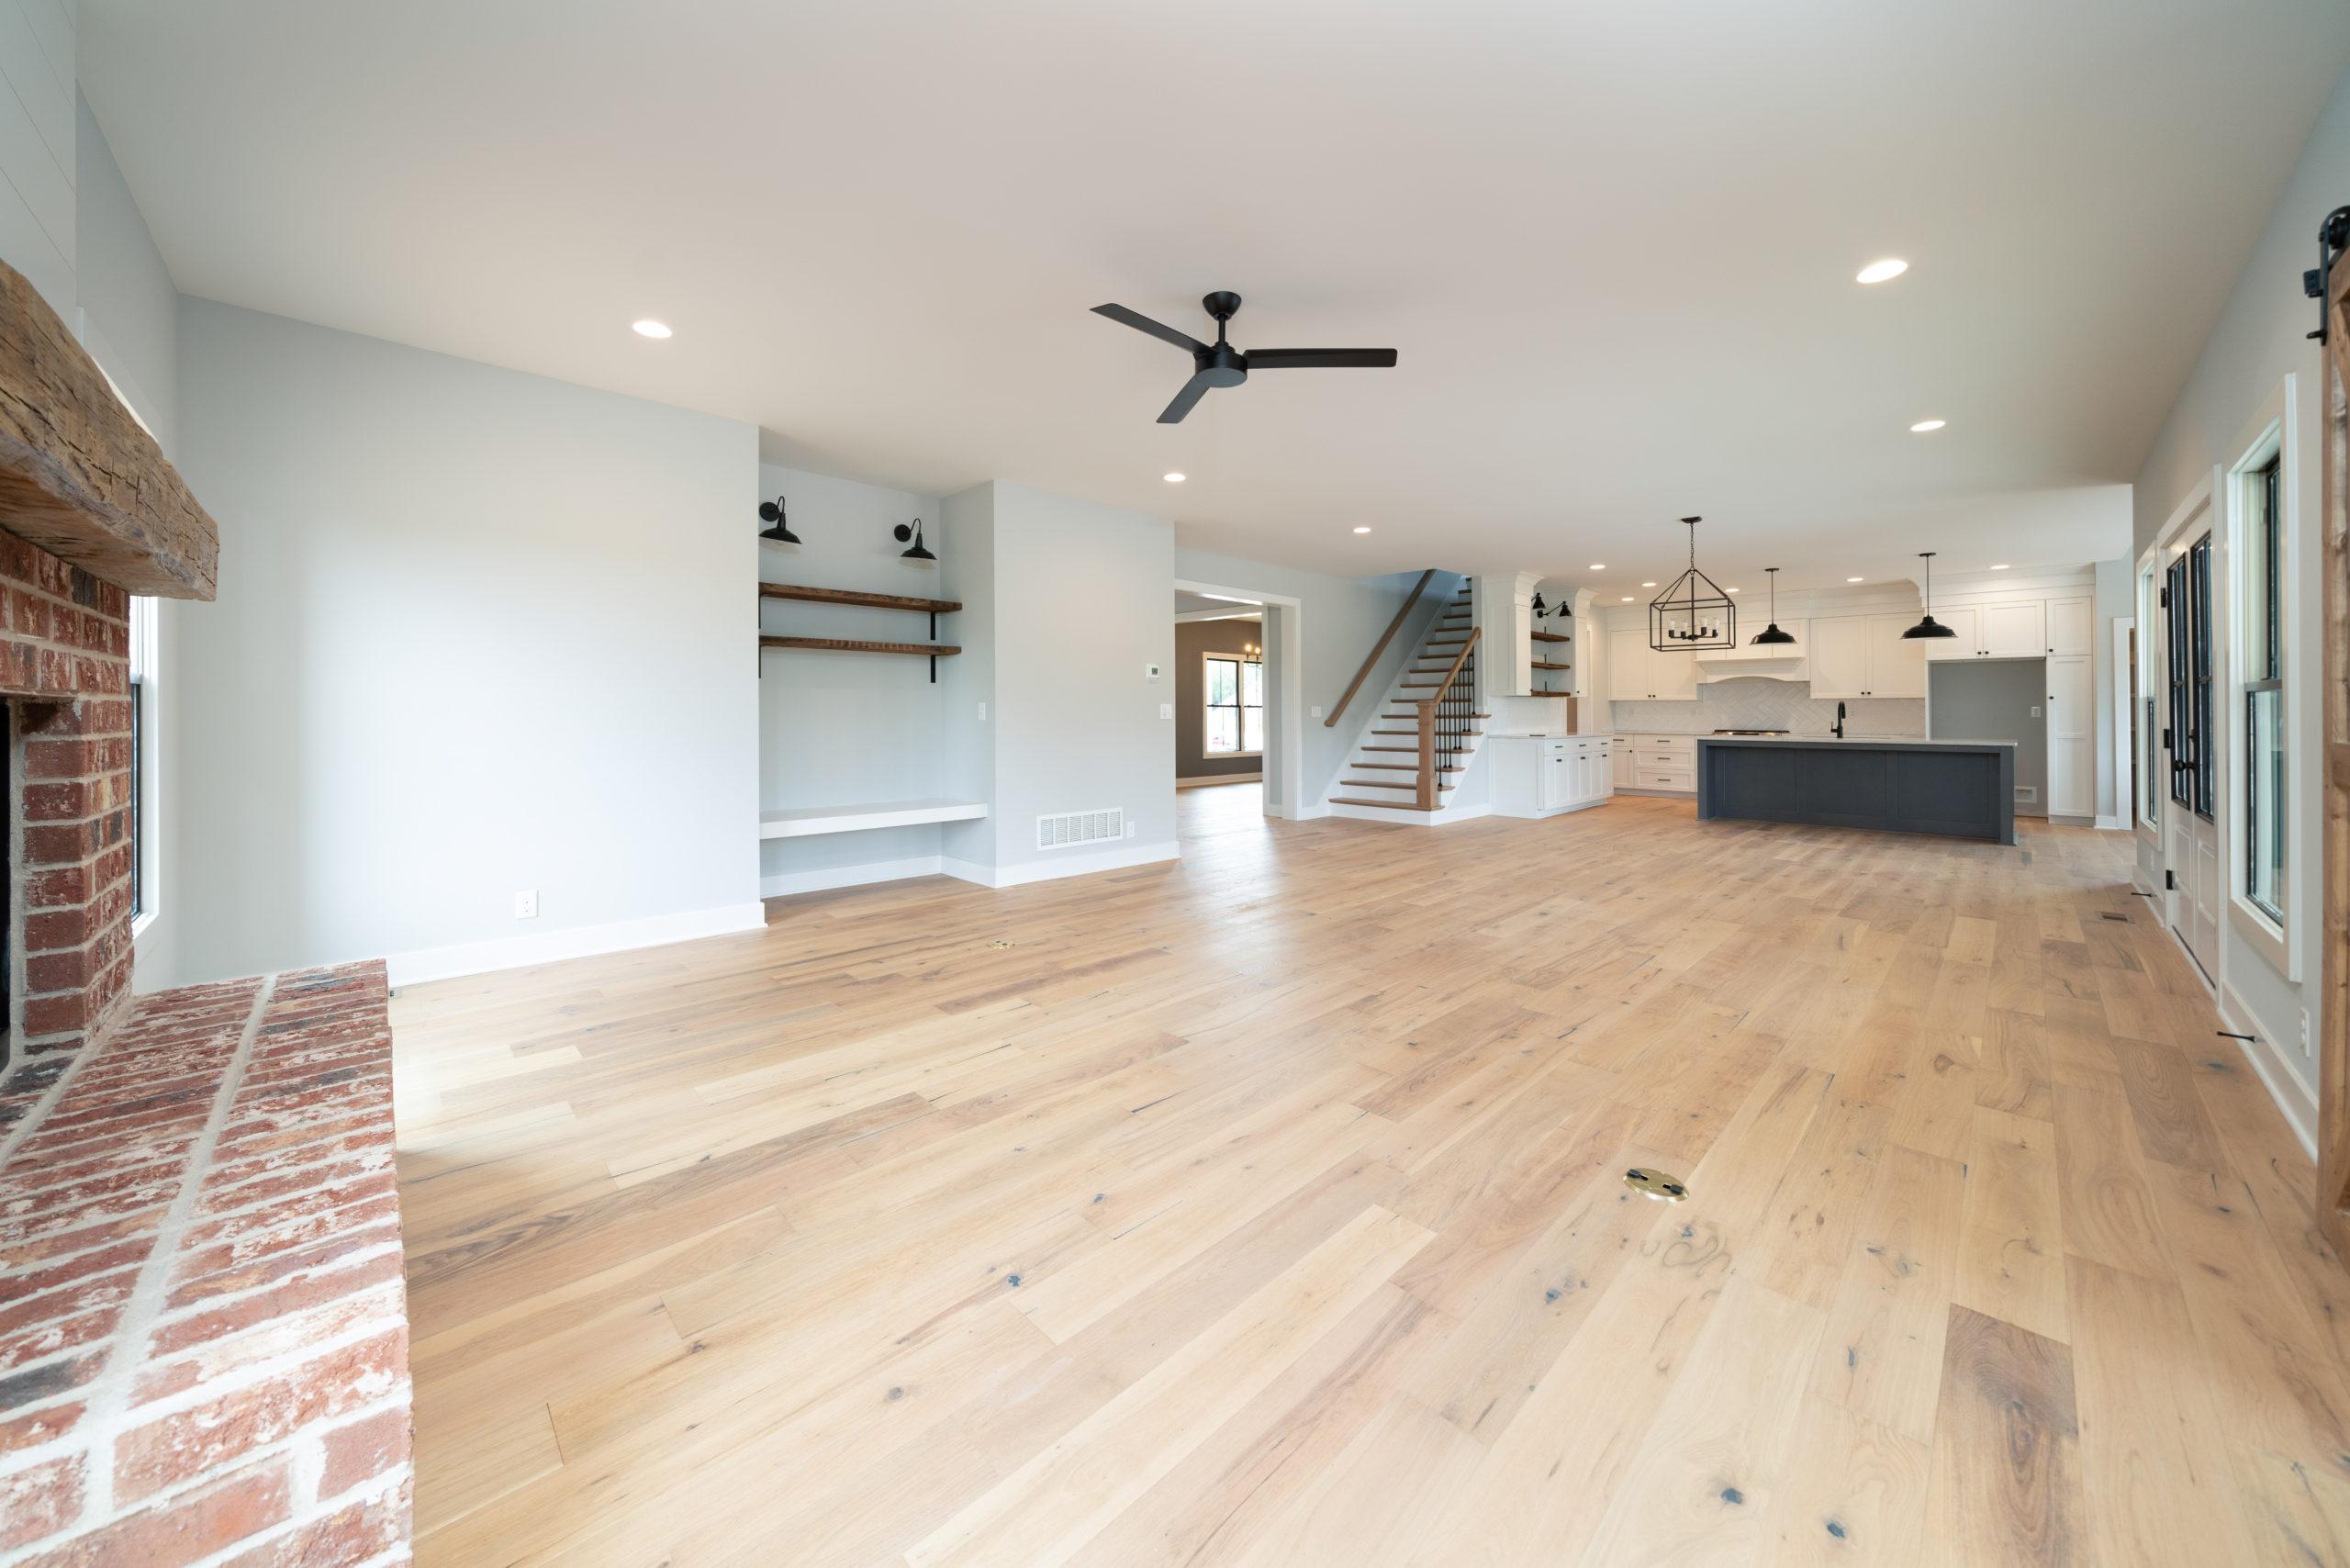 farmhouse living room with light hardwood floors